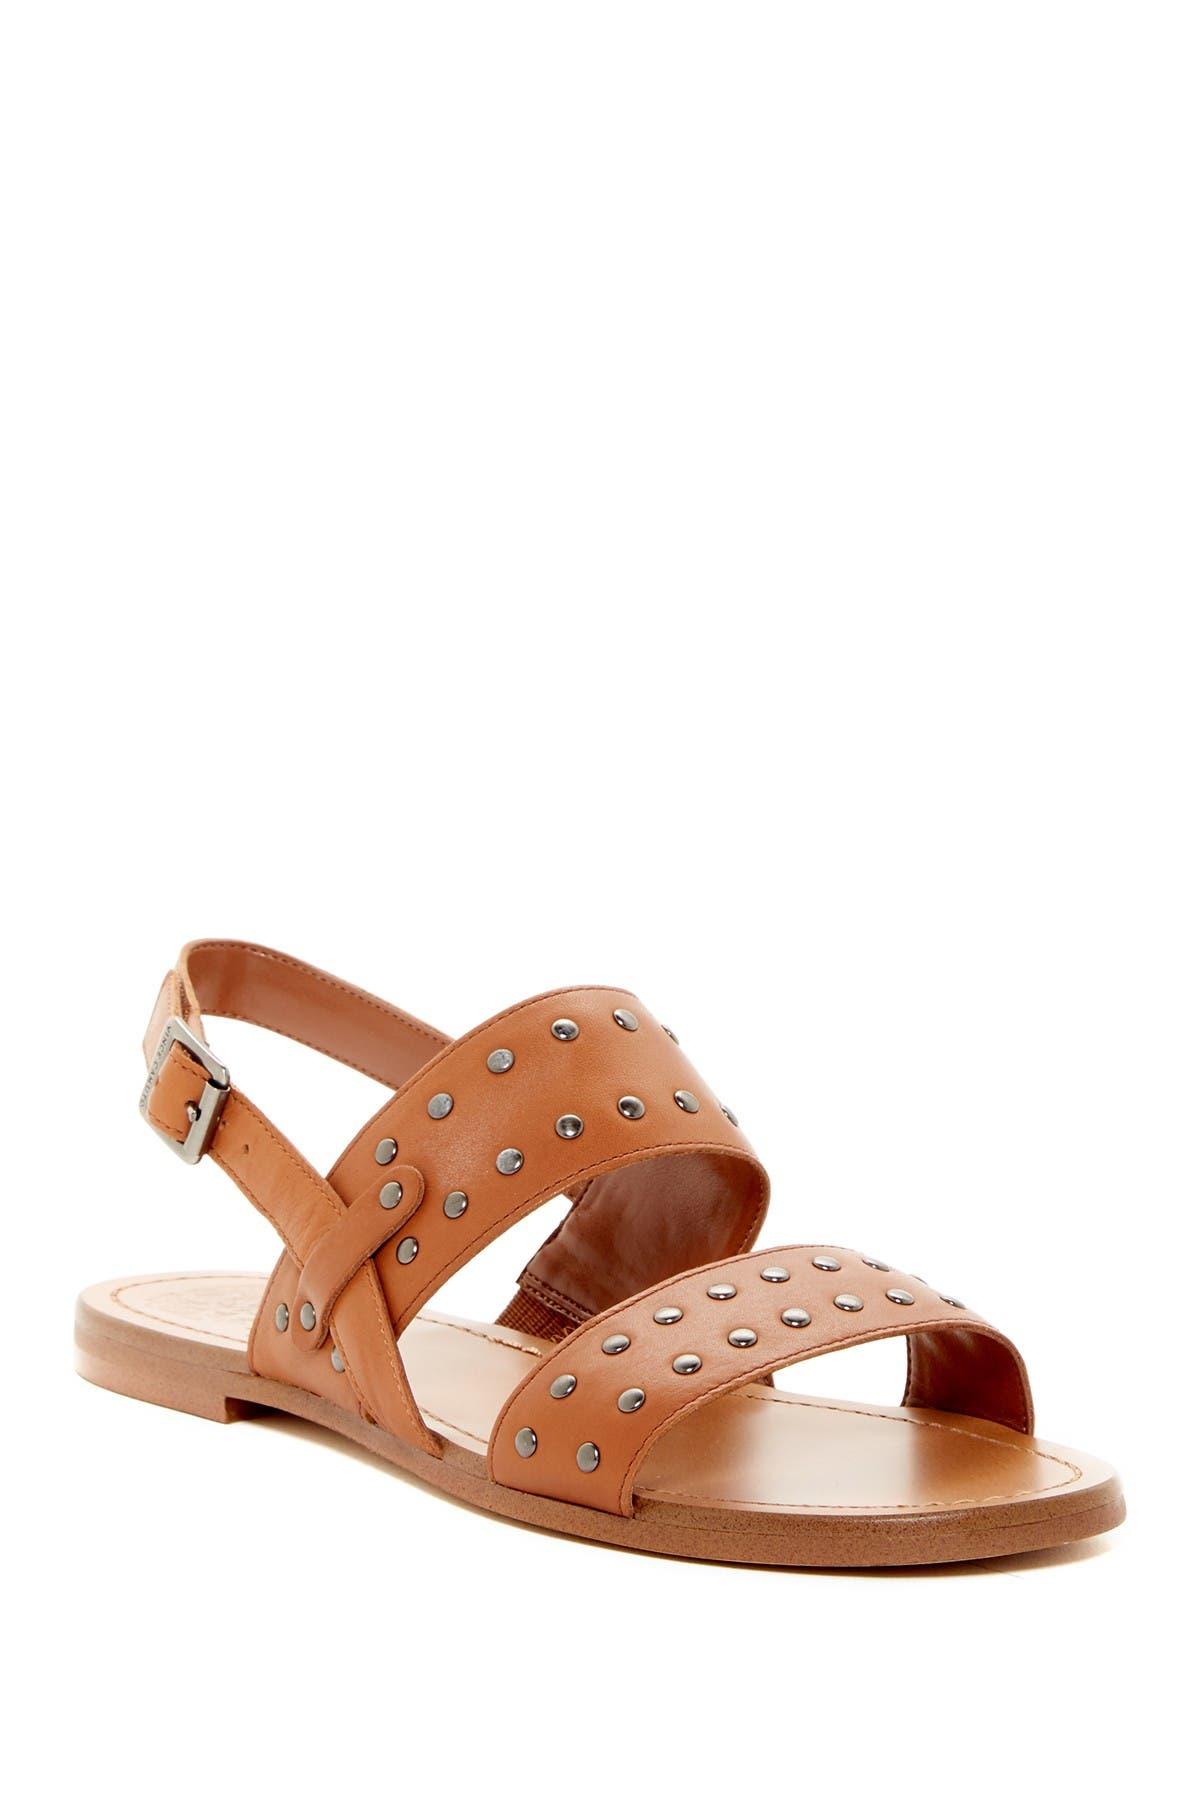 Image of Vince Camuto Rickita Studded Leather Sandal